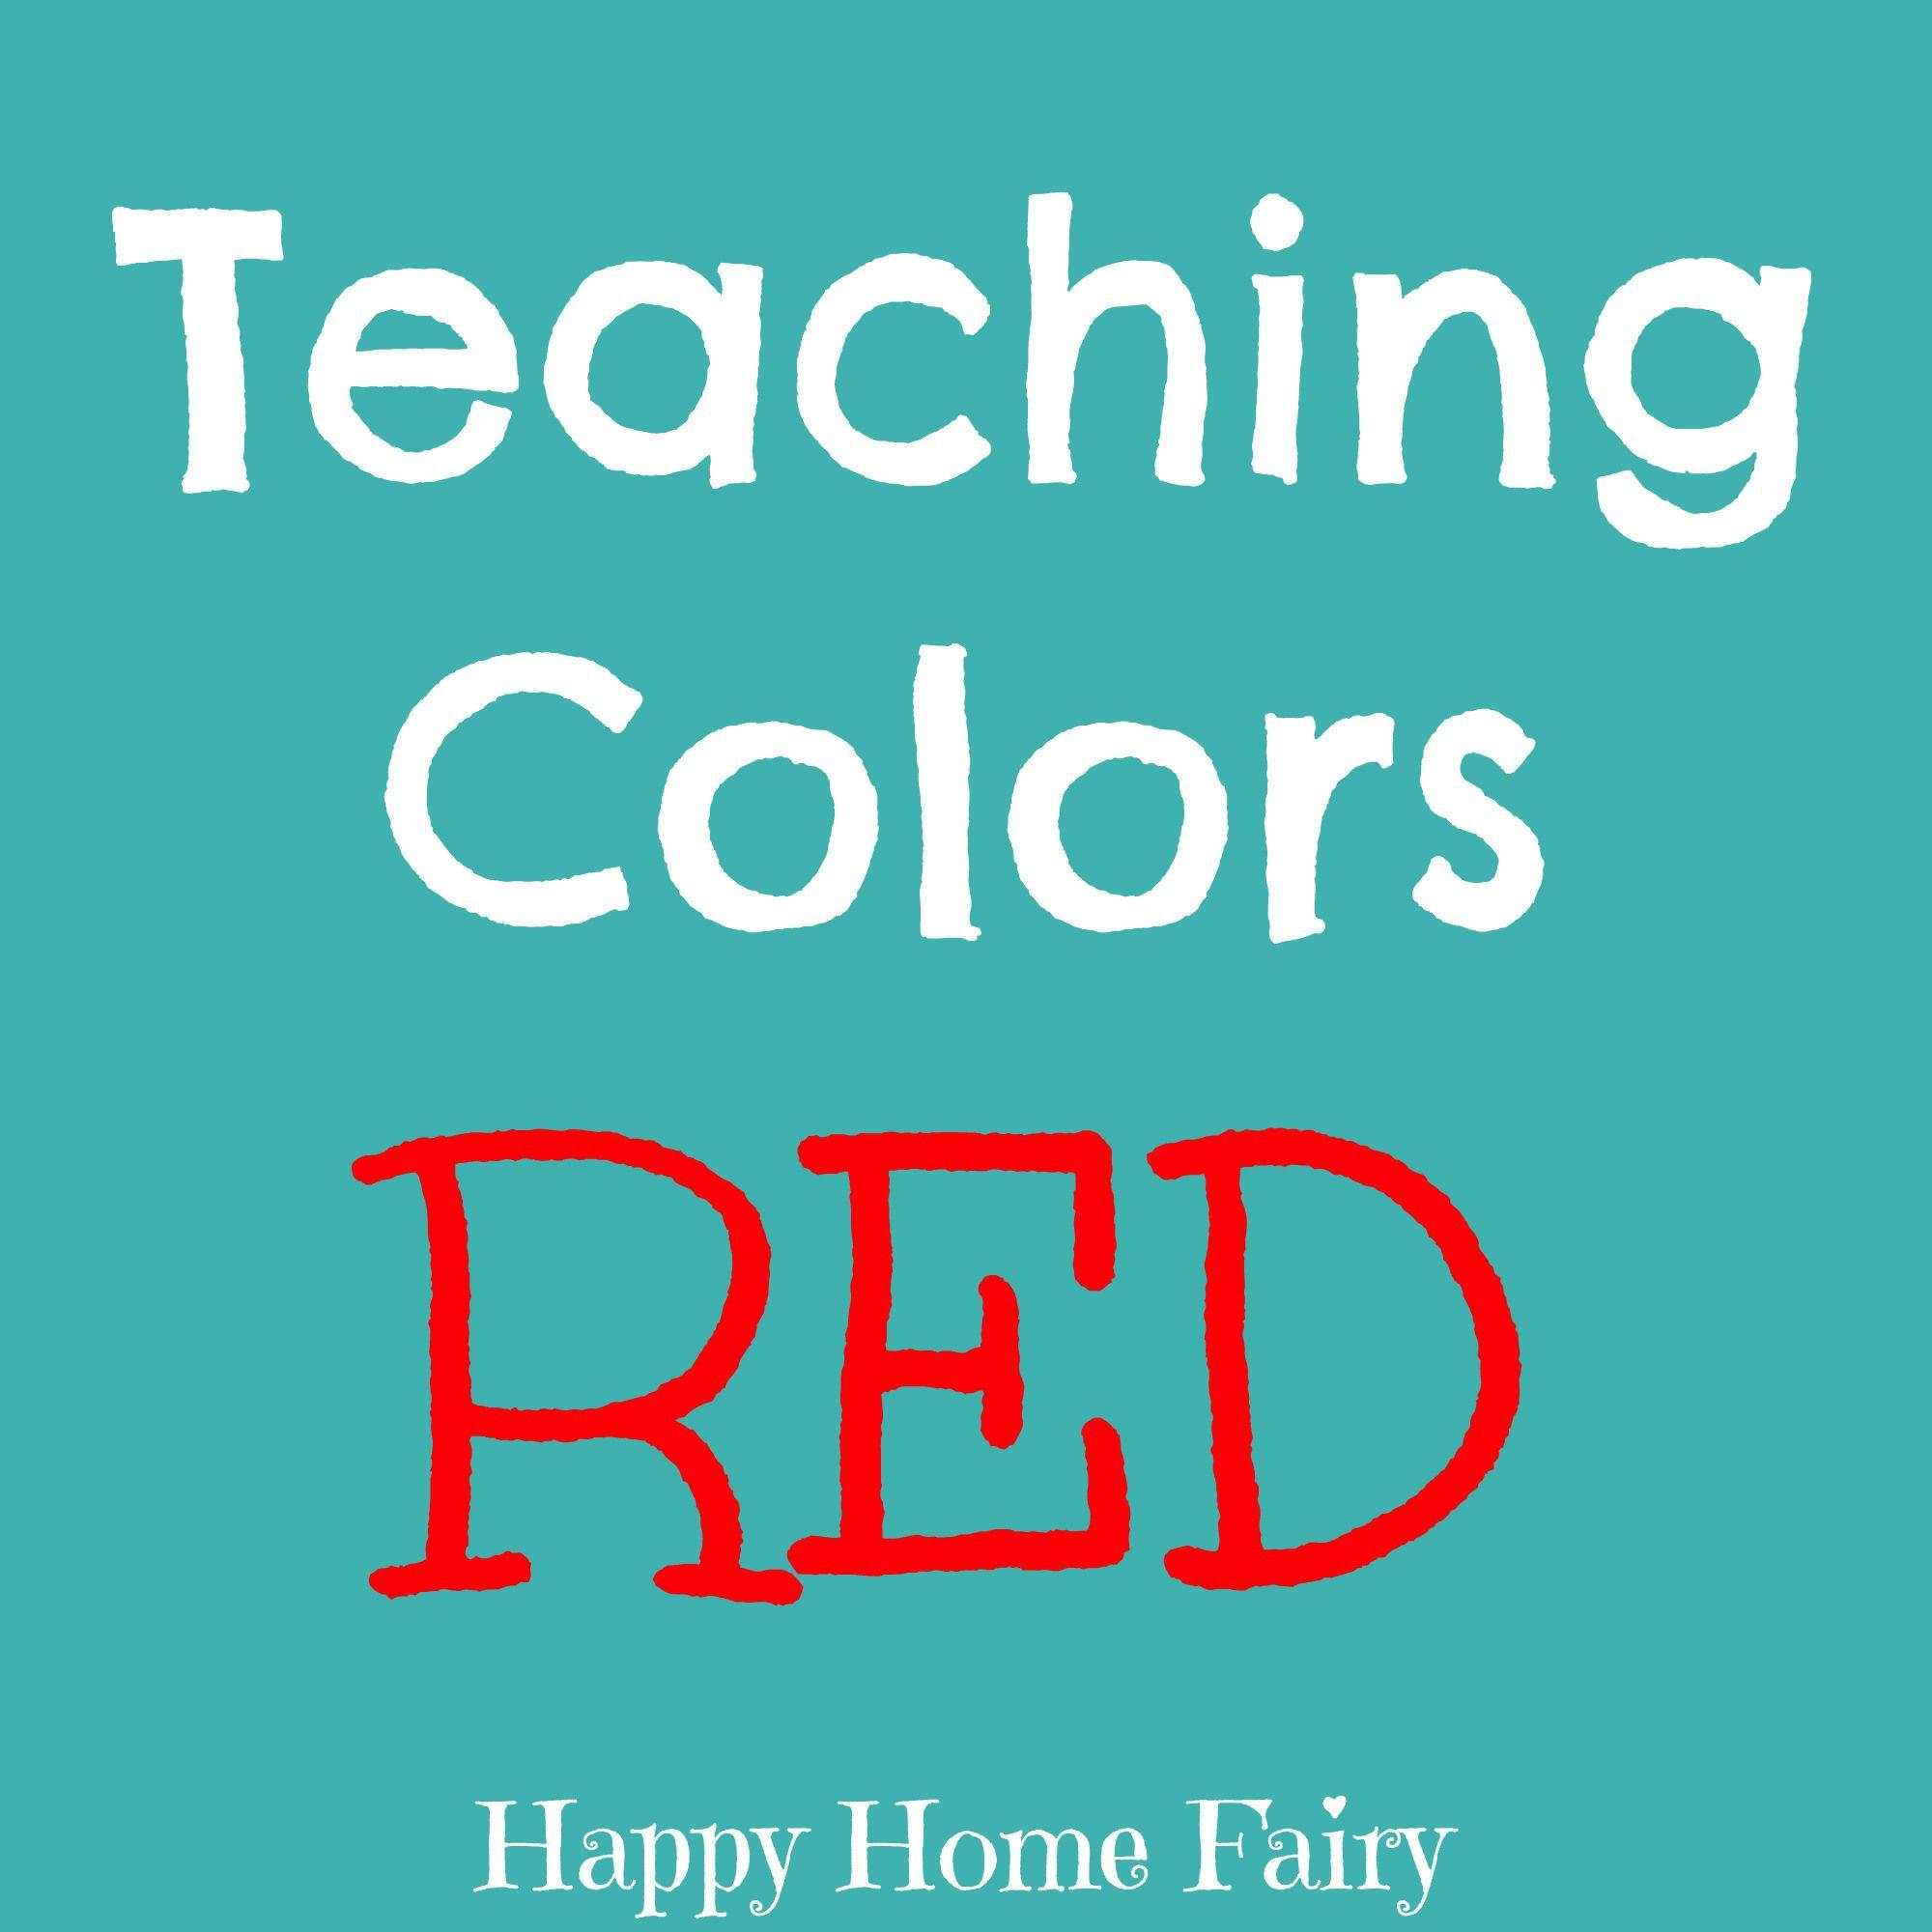 Teaching Colors